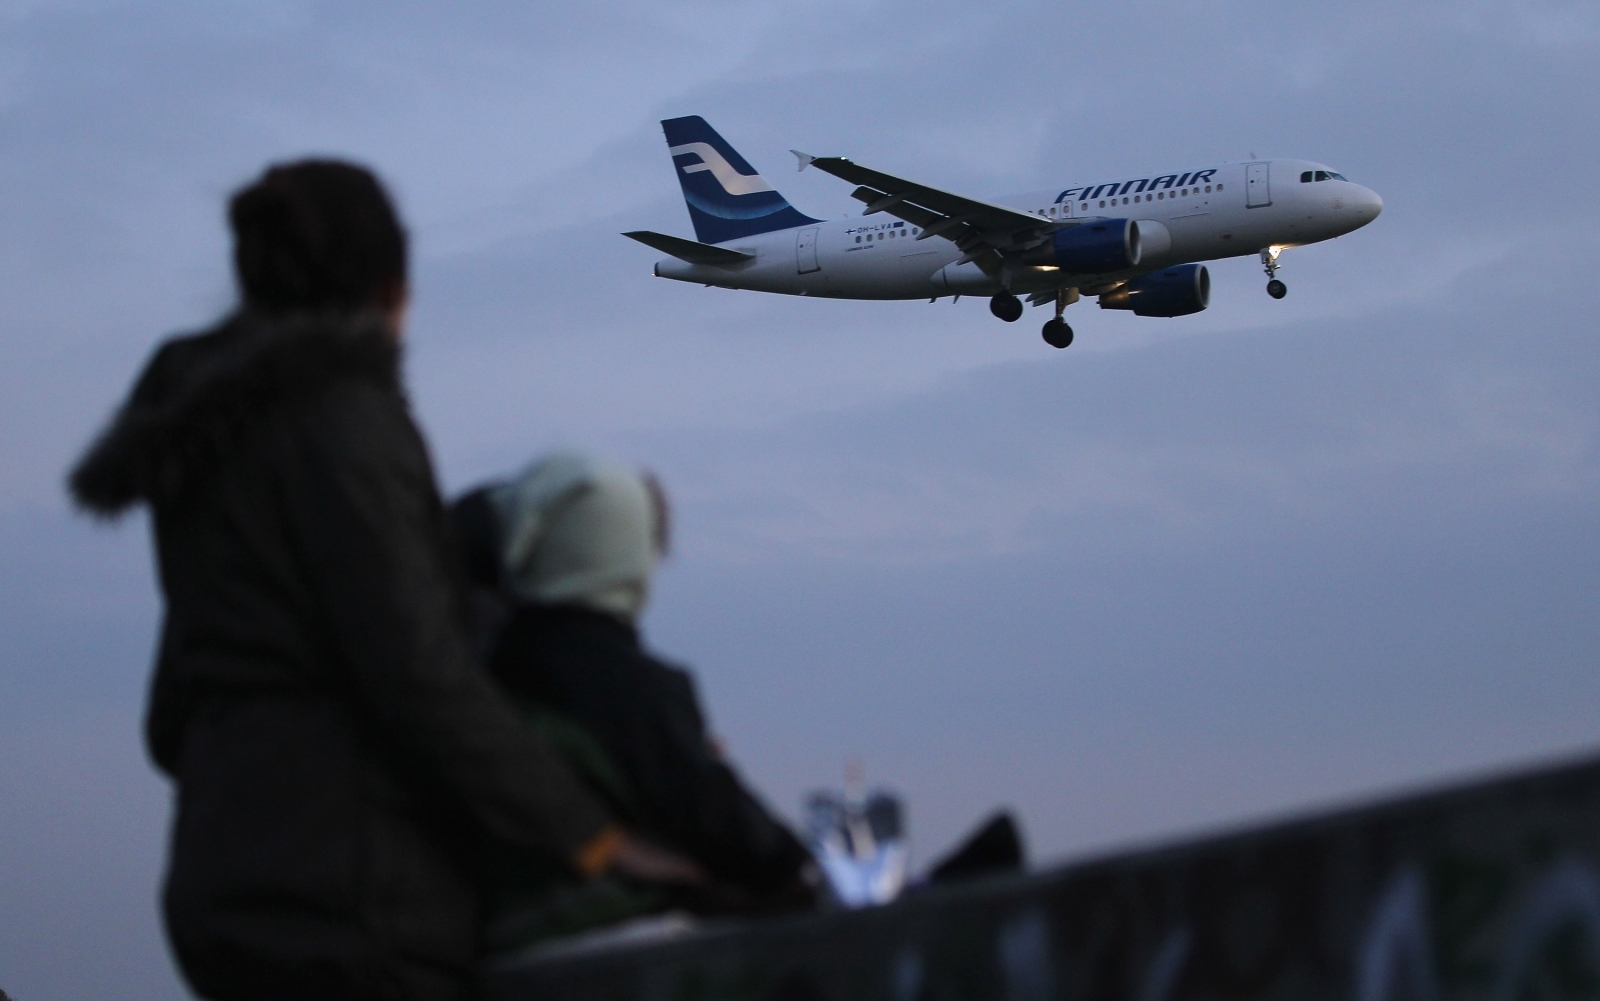 Arriving Finnair plane